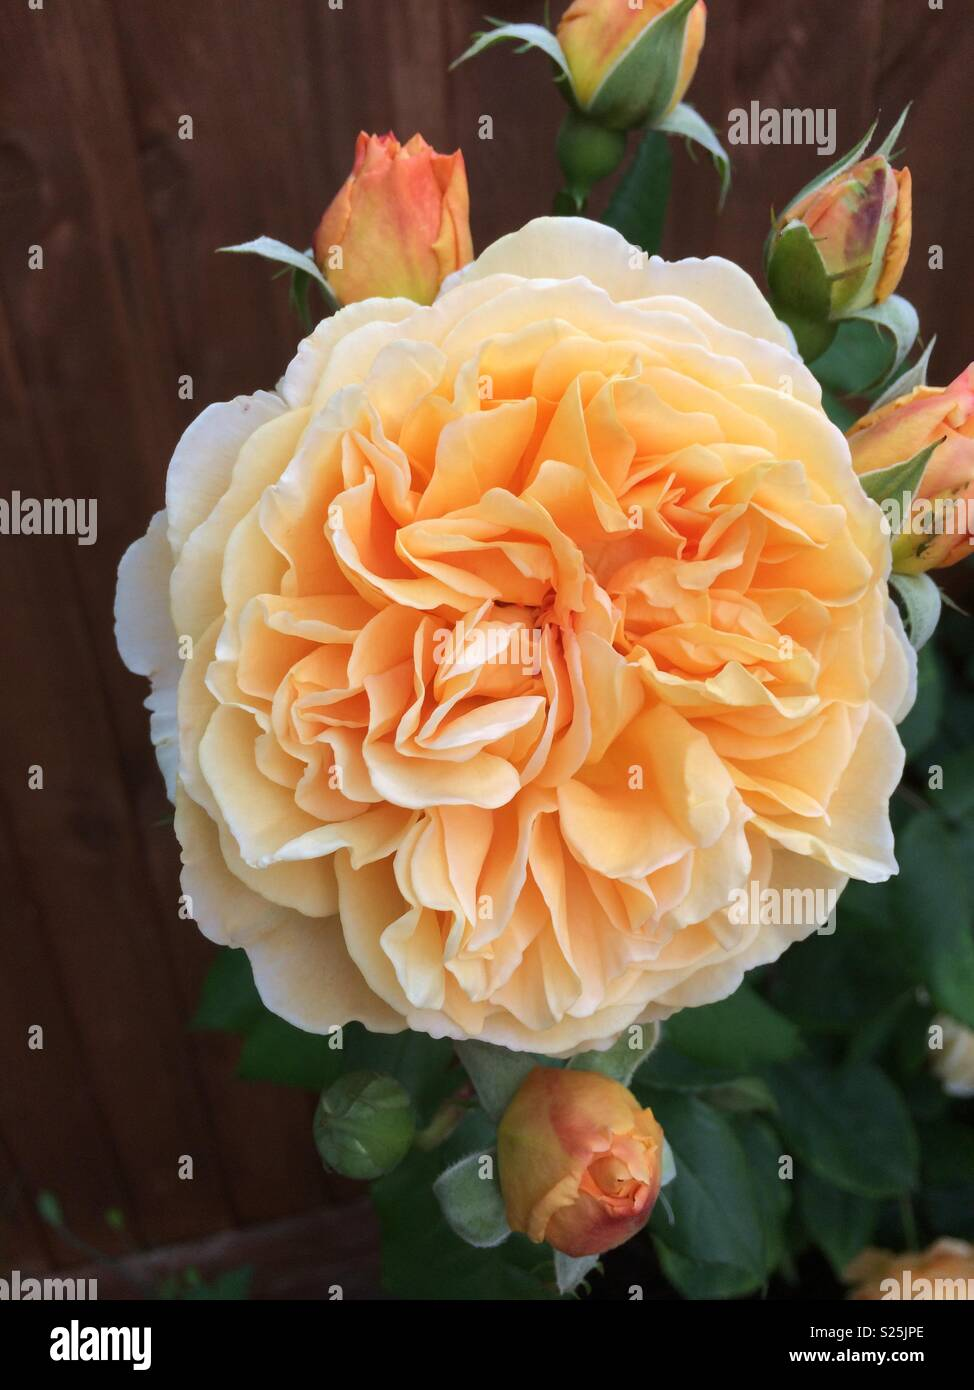 Peach coloured rose - Stock Image